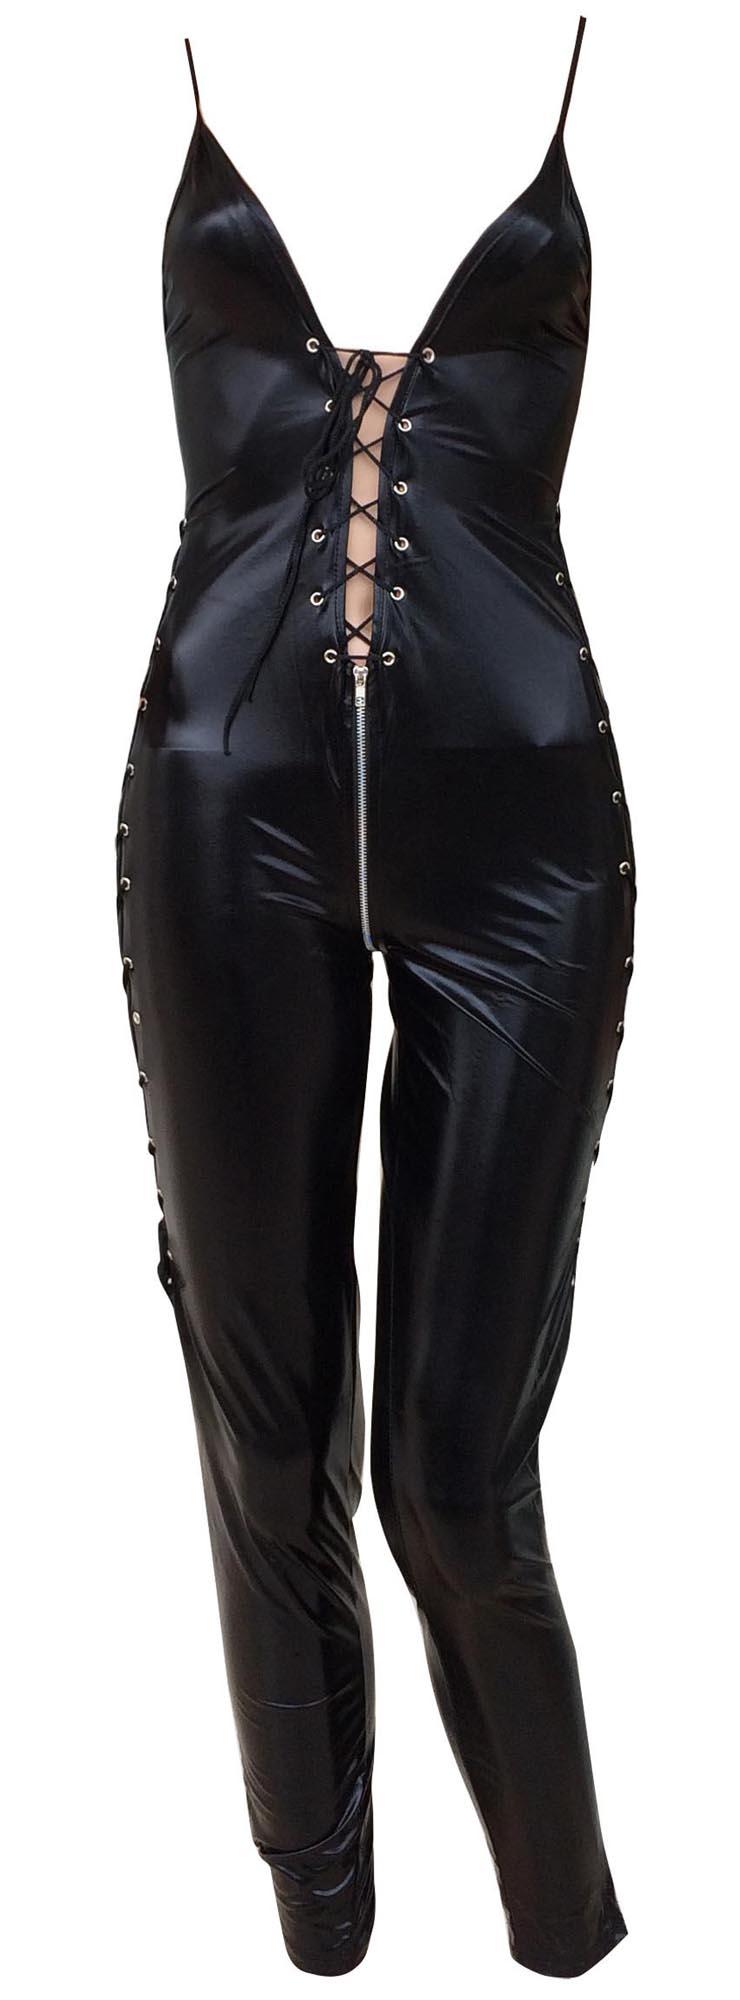 Black Criss Cross Bodysuit, Deep V Criss Cross Jumpsuit, Sleeveless Lace Up Catsuit, #N8507